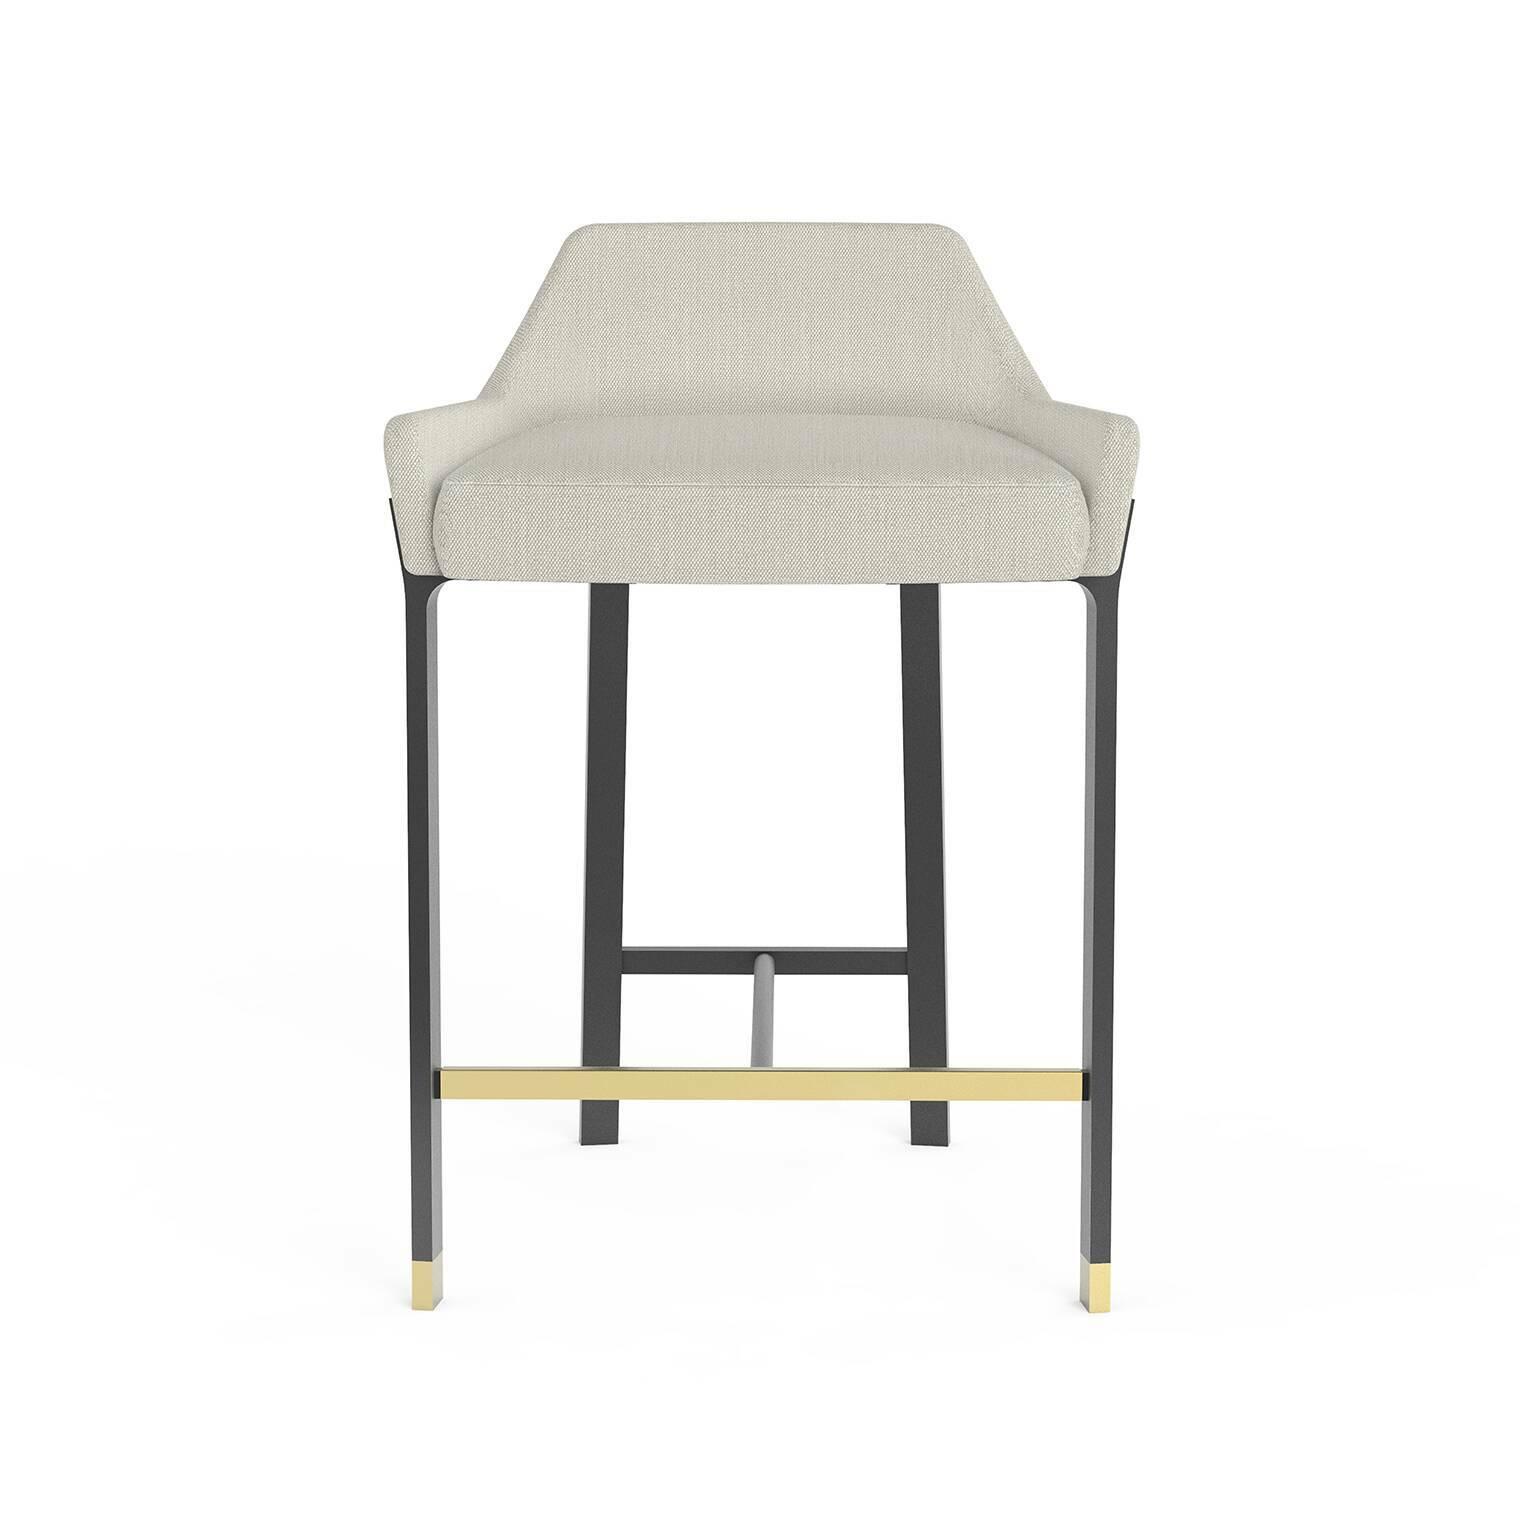 Барный стул Stellar works 15576487 от Cosmorelax